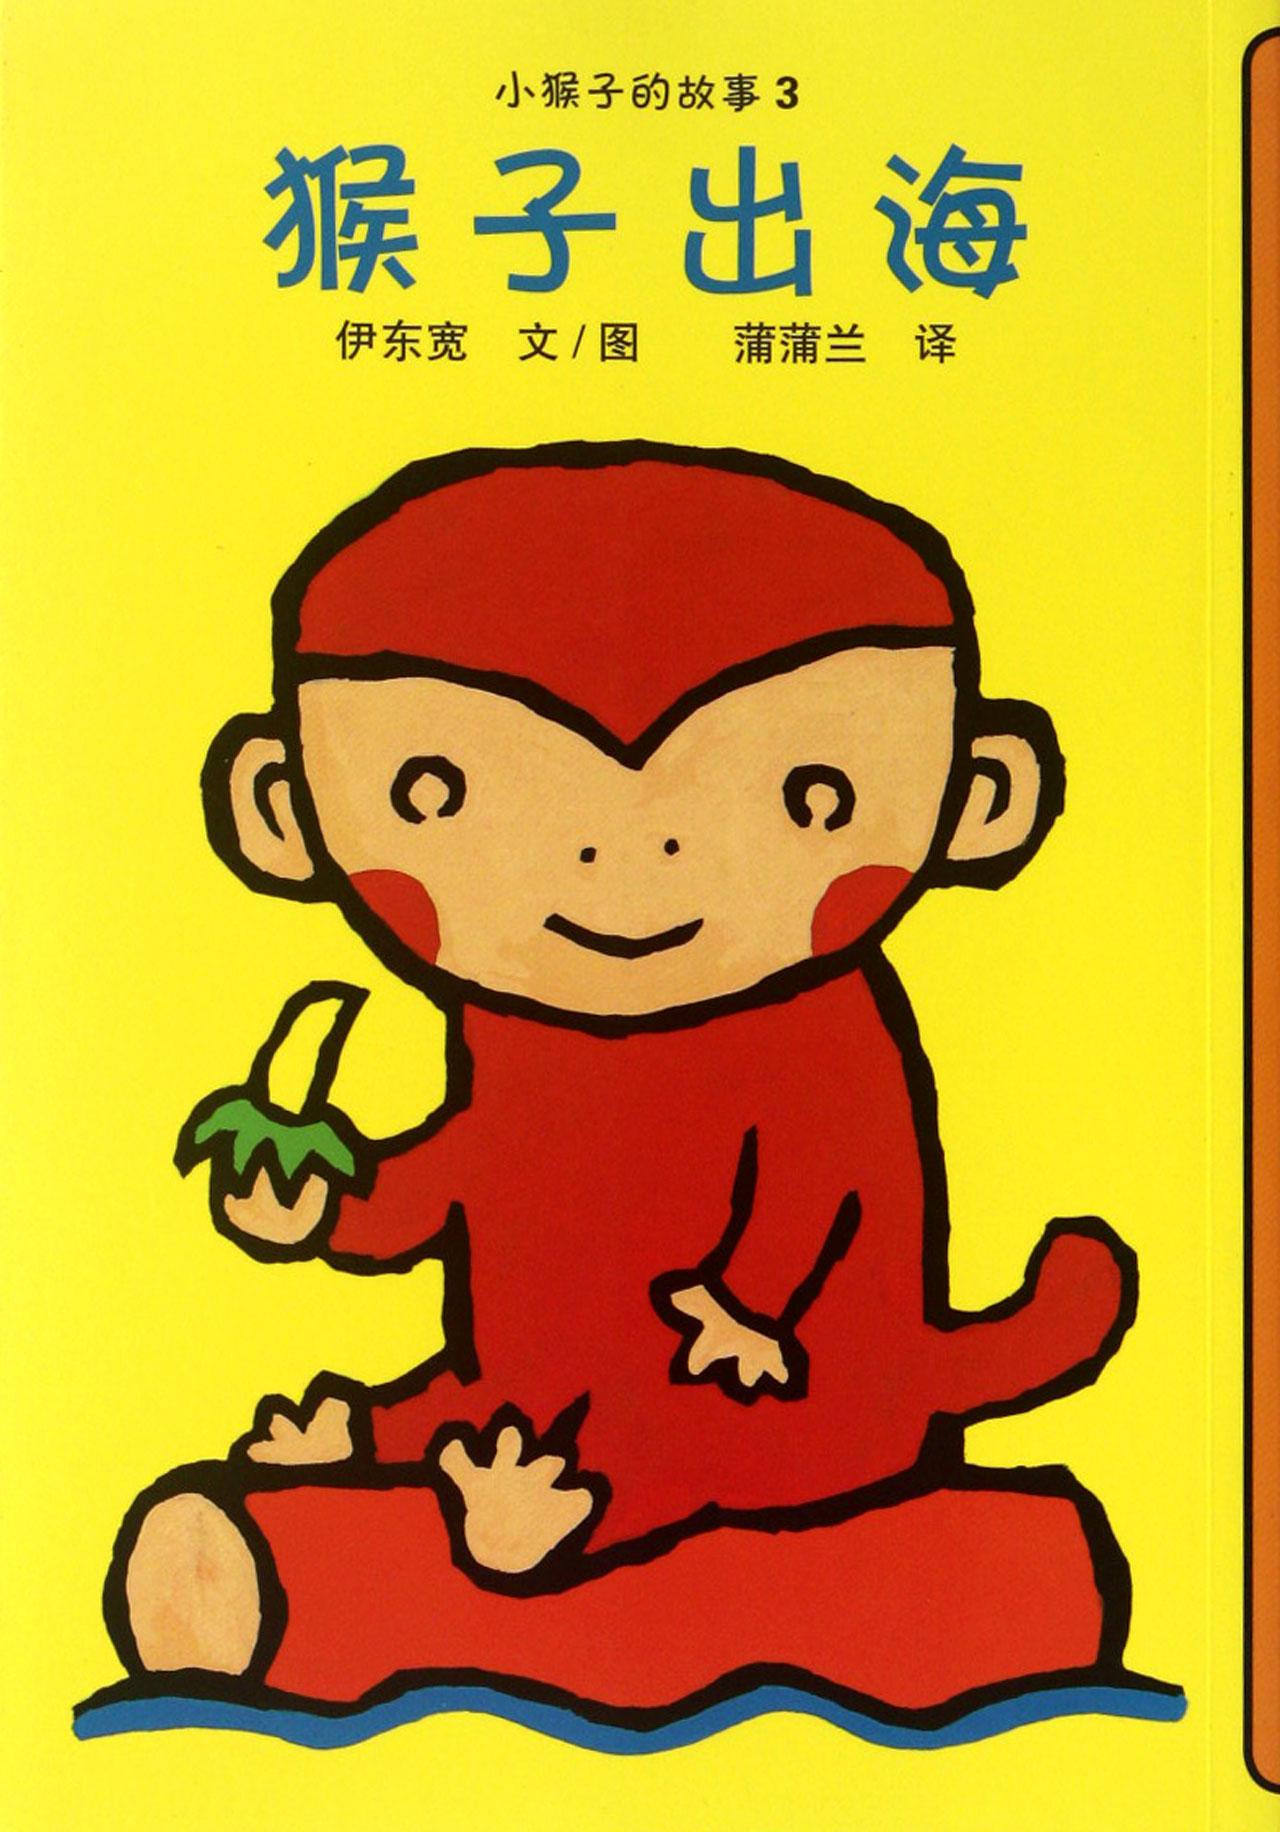 猴子头像怎么折